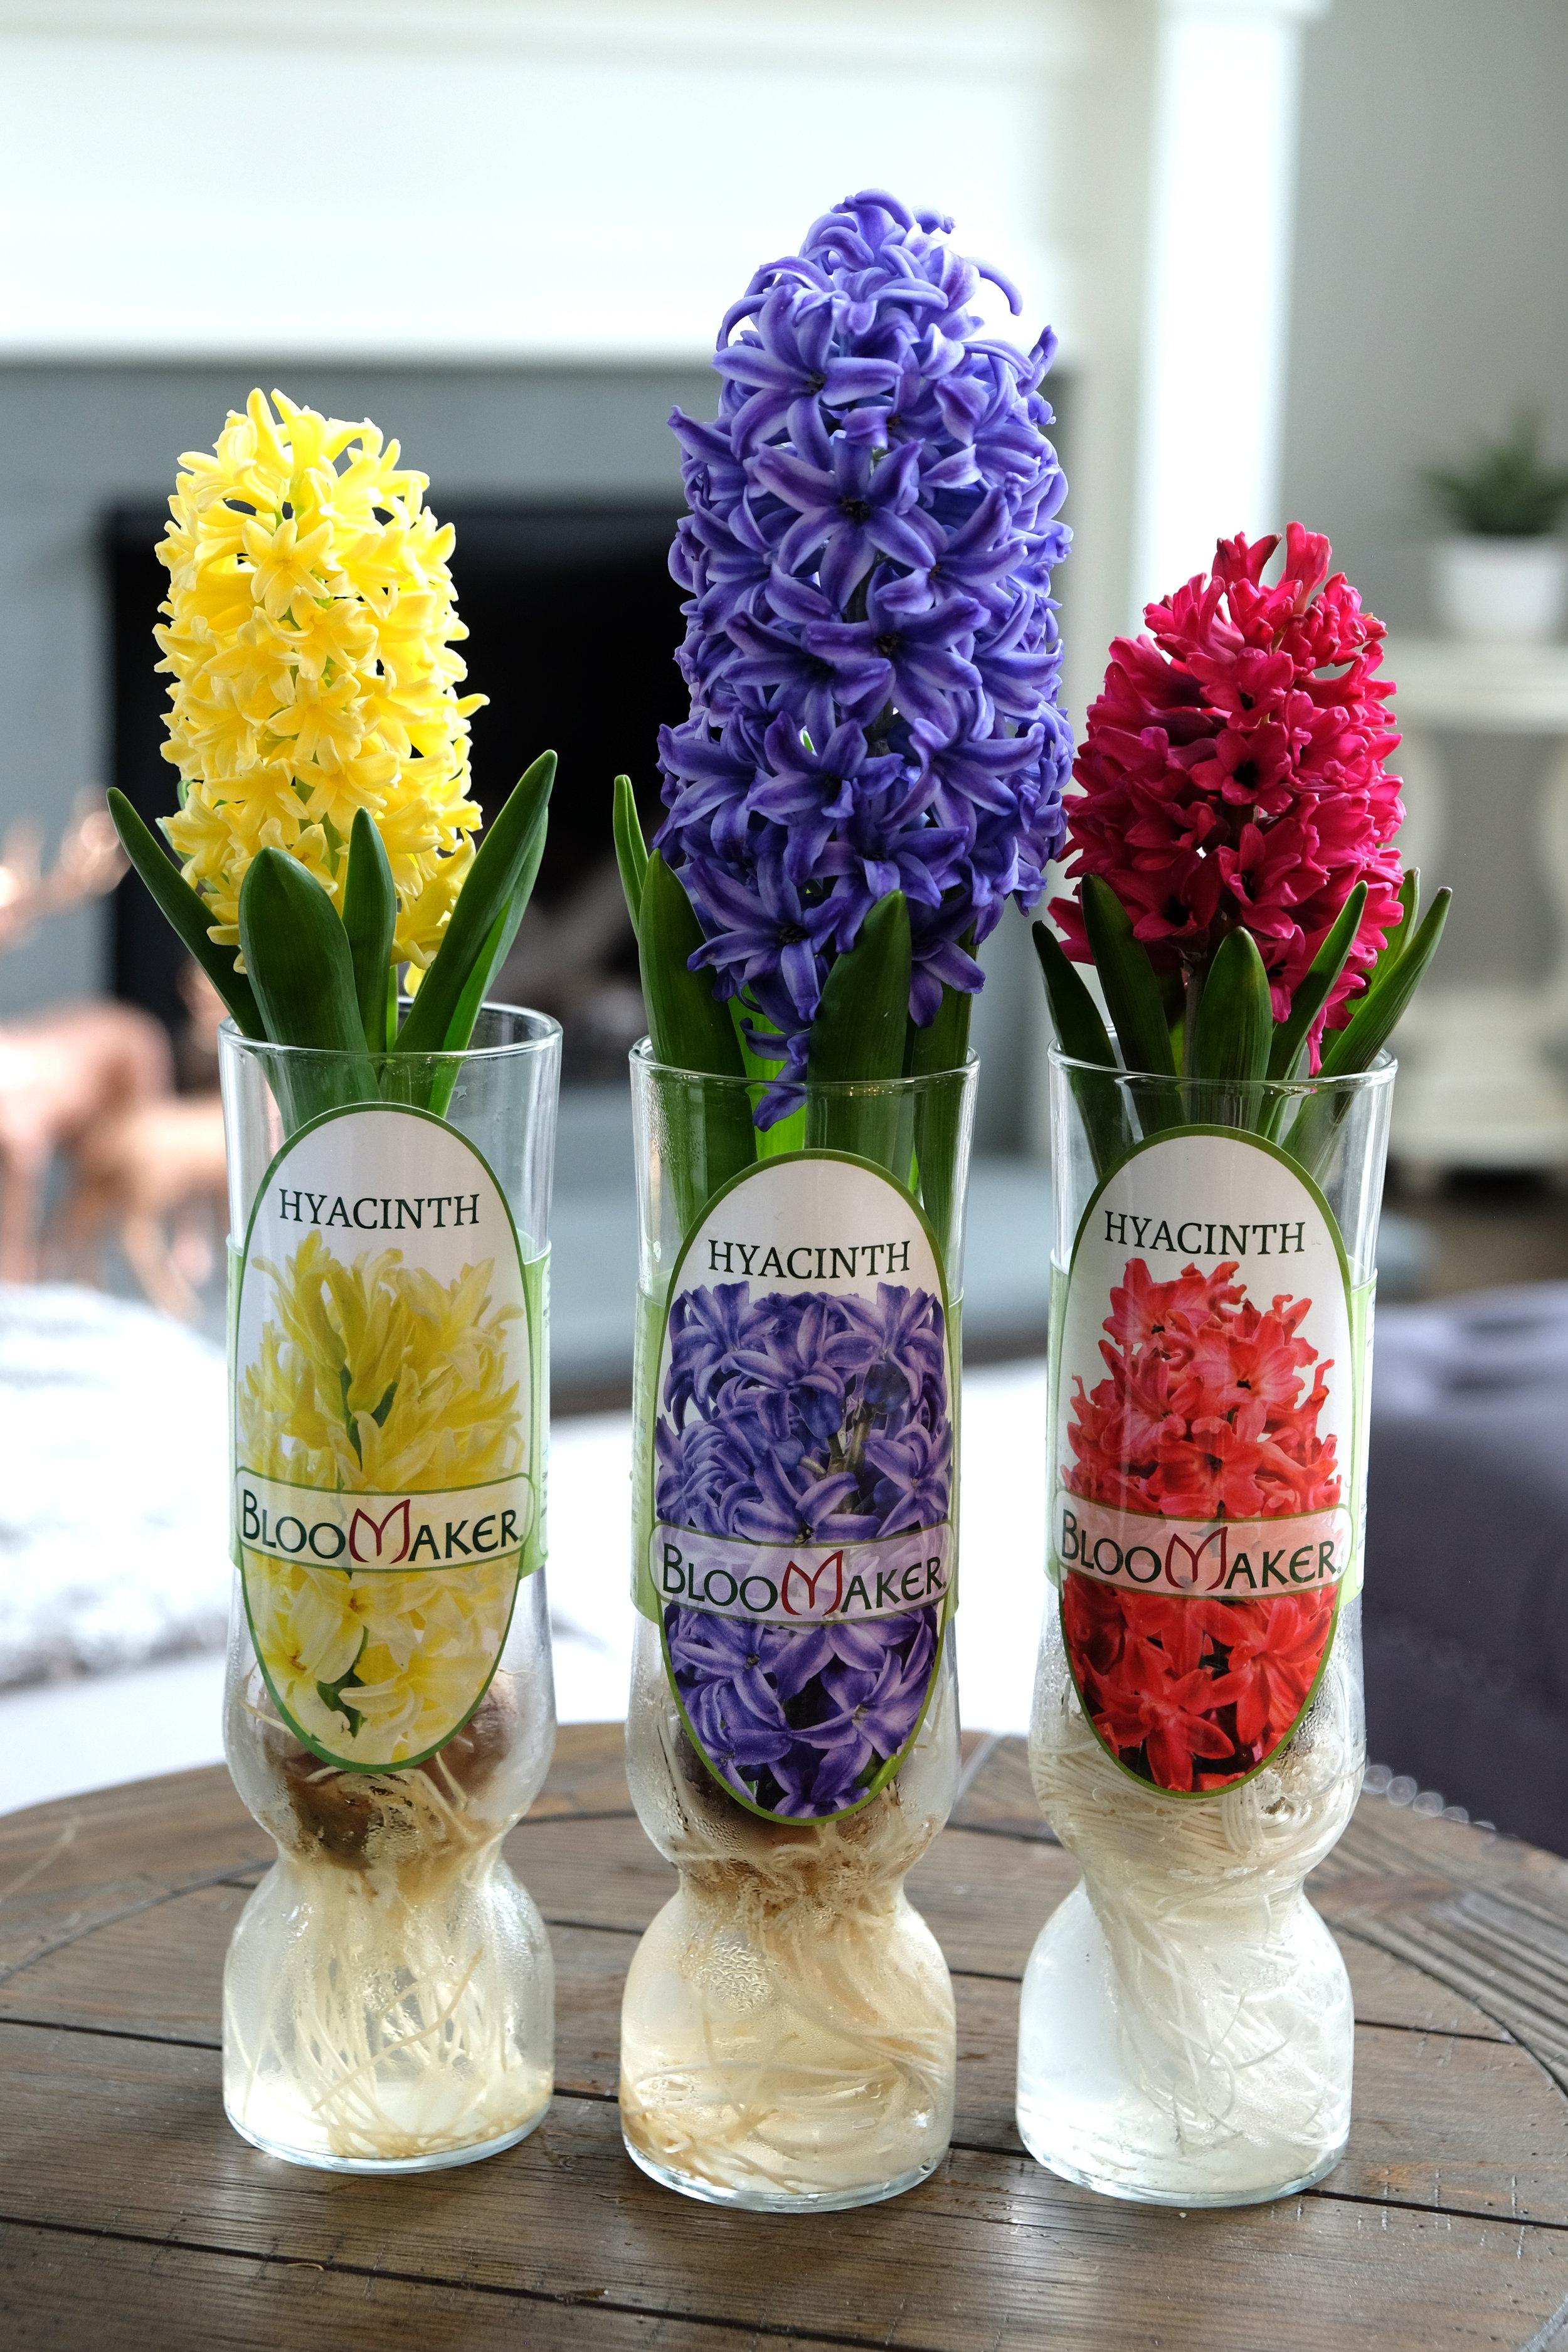 Hyacinths DSCF4779.jpg